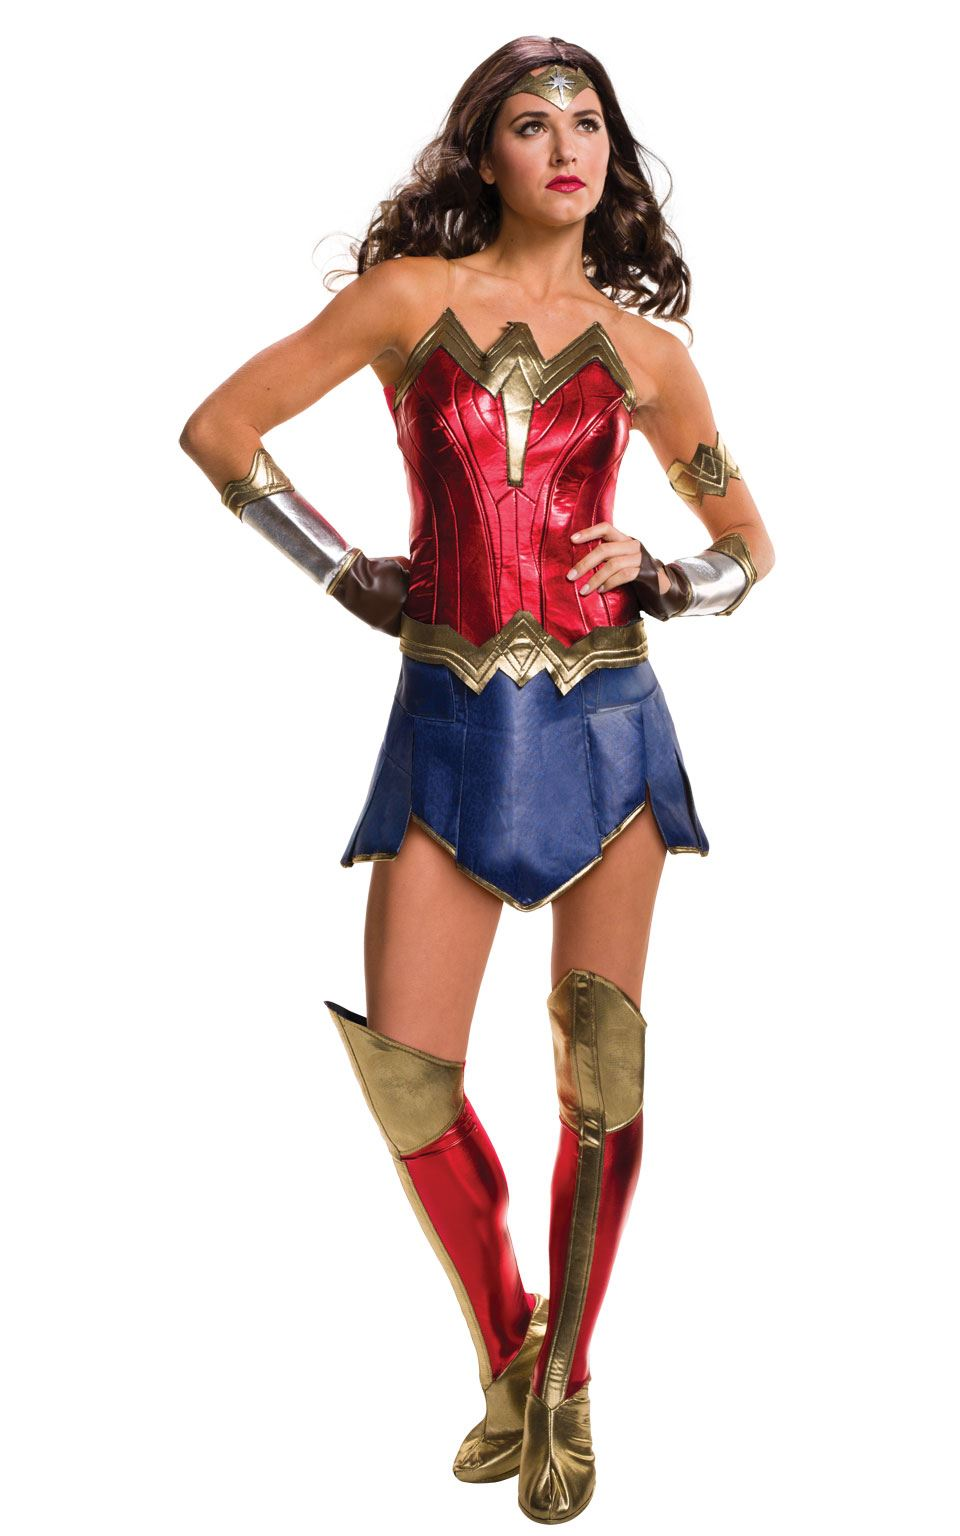 Donna Top Wonderwoman con Capo Costume Outfit UK 8-10